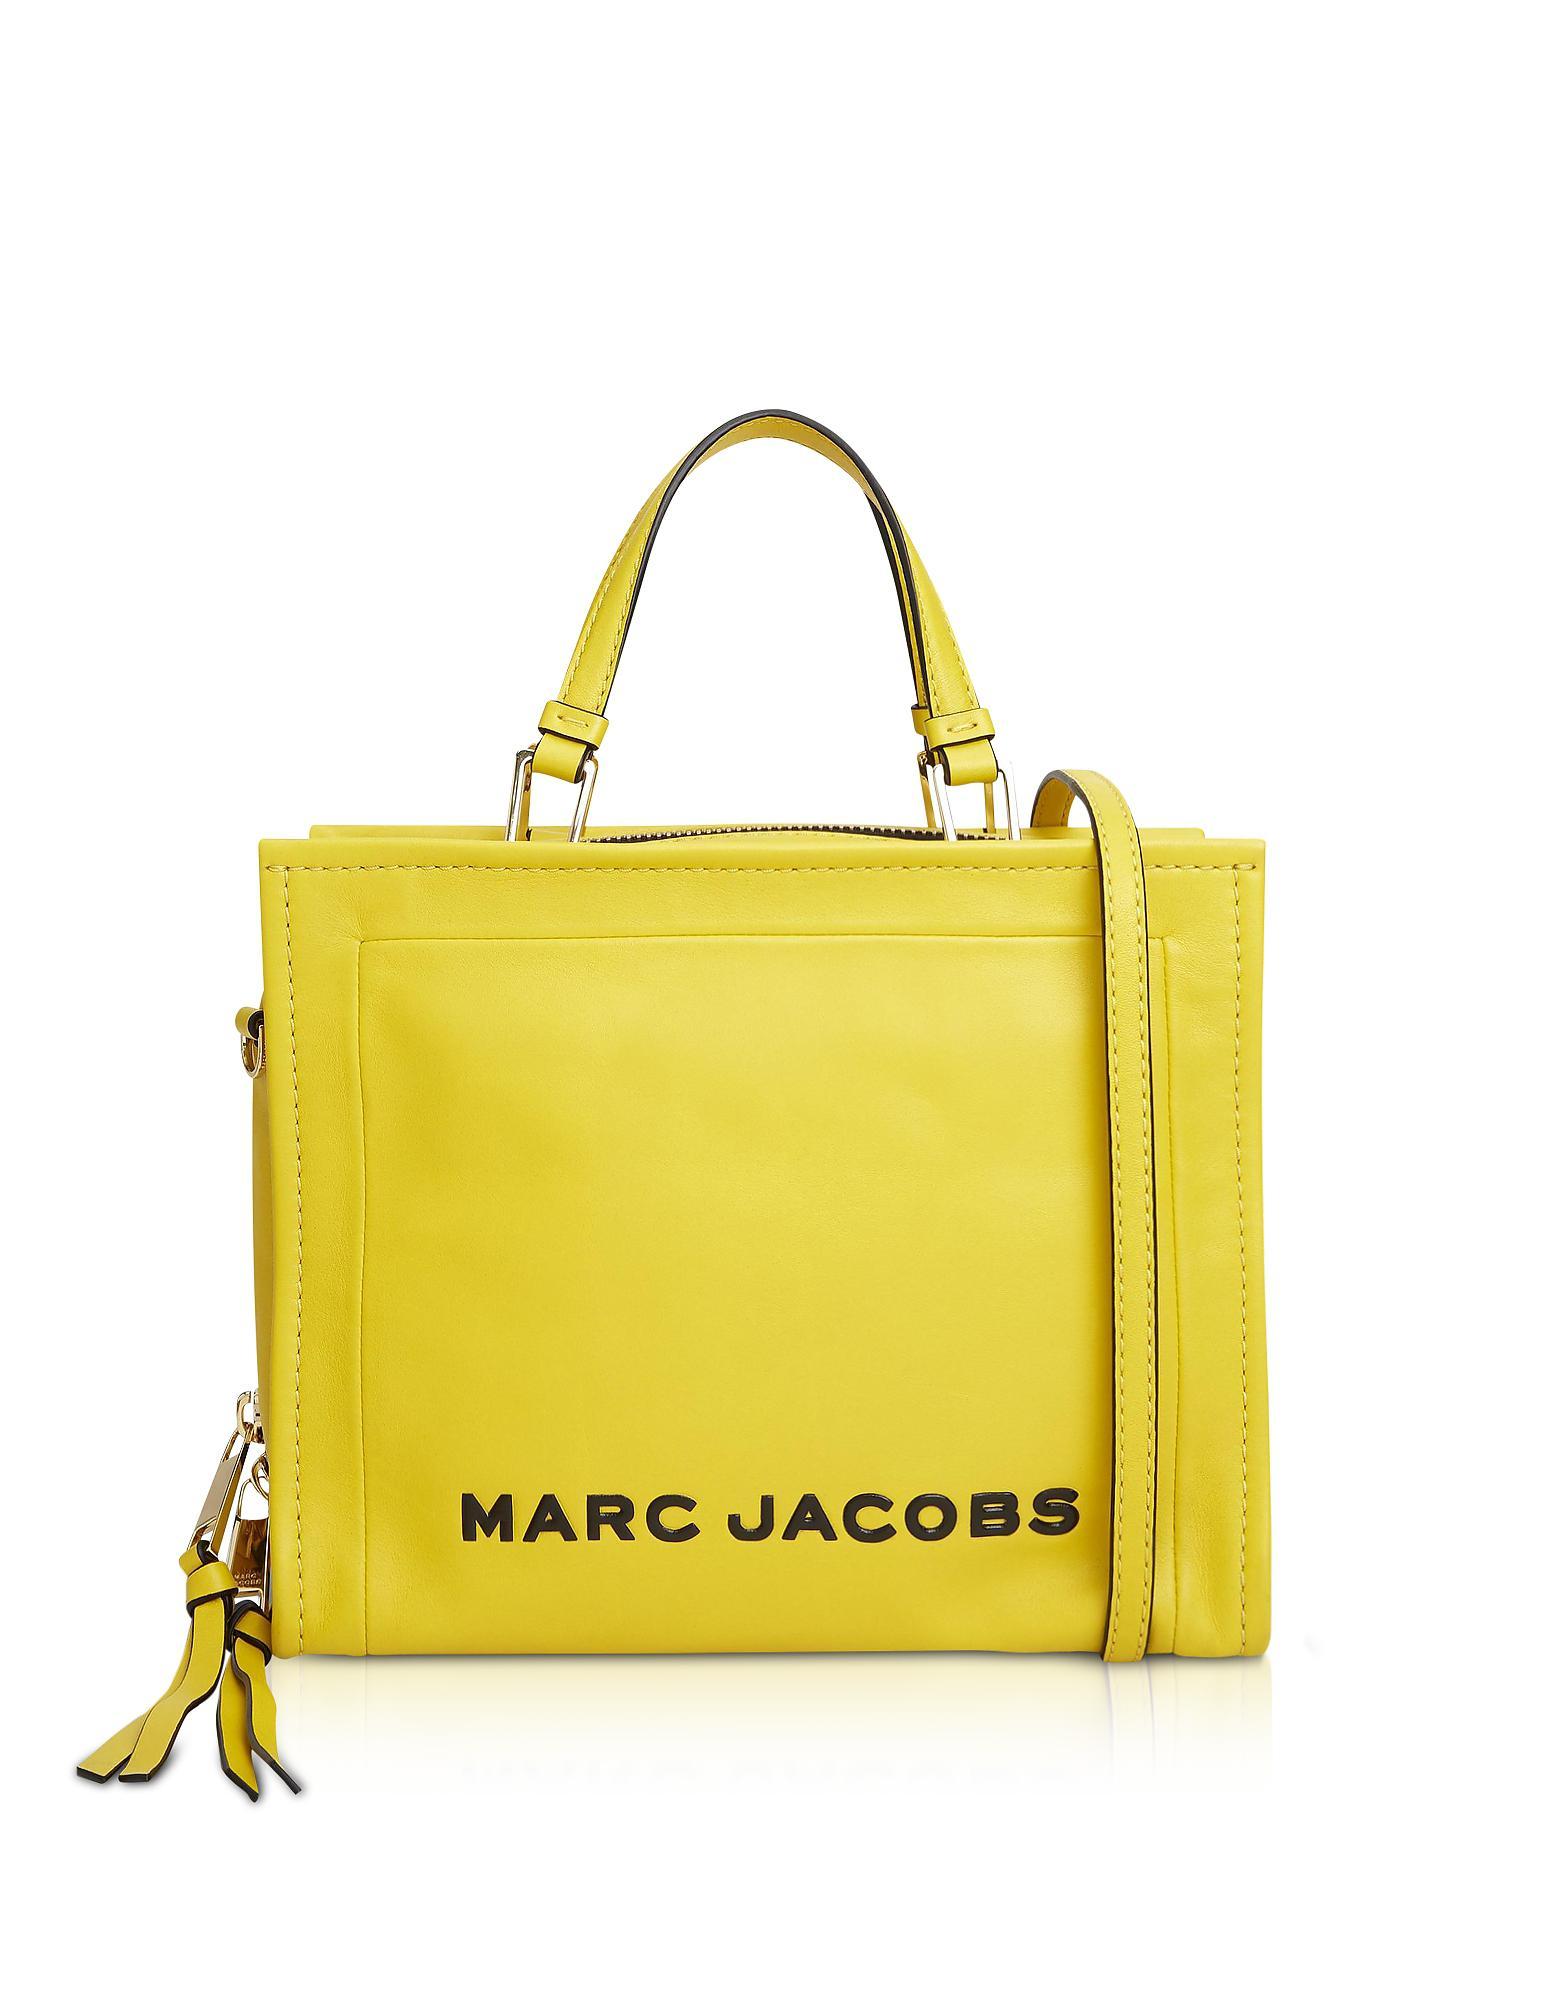 Marc Jacobs The Box Shopper Bag in Yellow - Lyst 4e0d70871de16